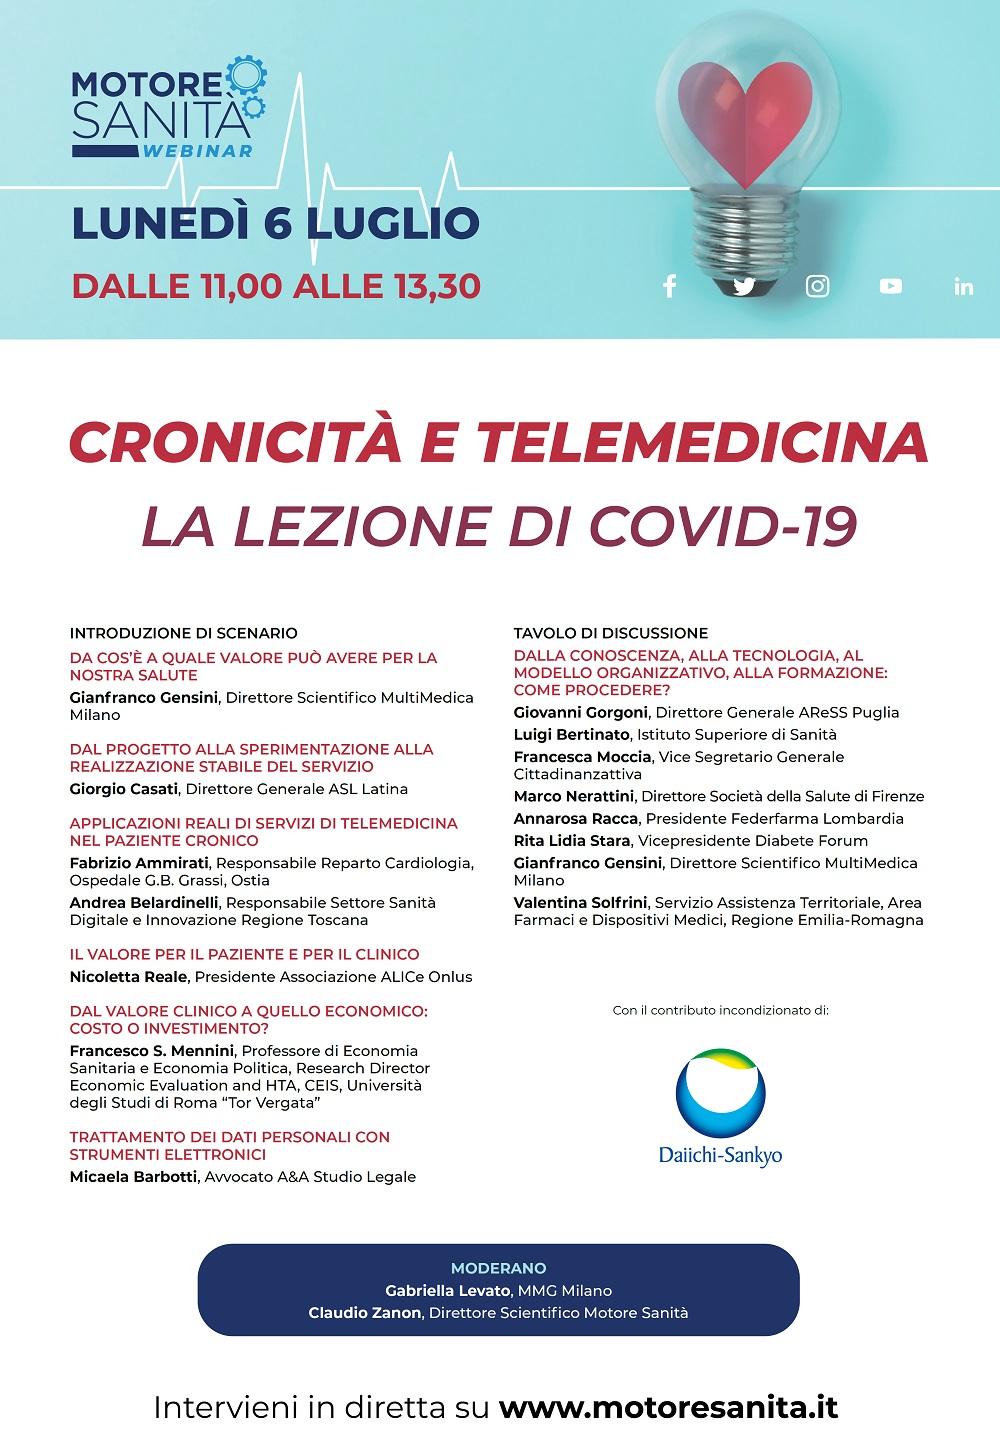 Cronicità e telemedicina